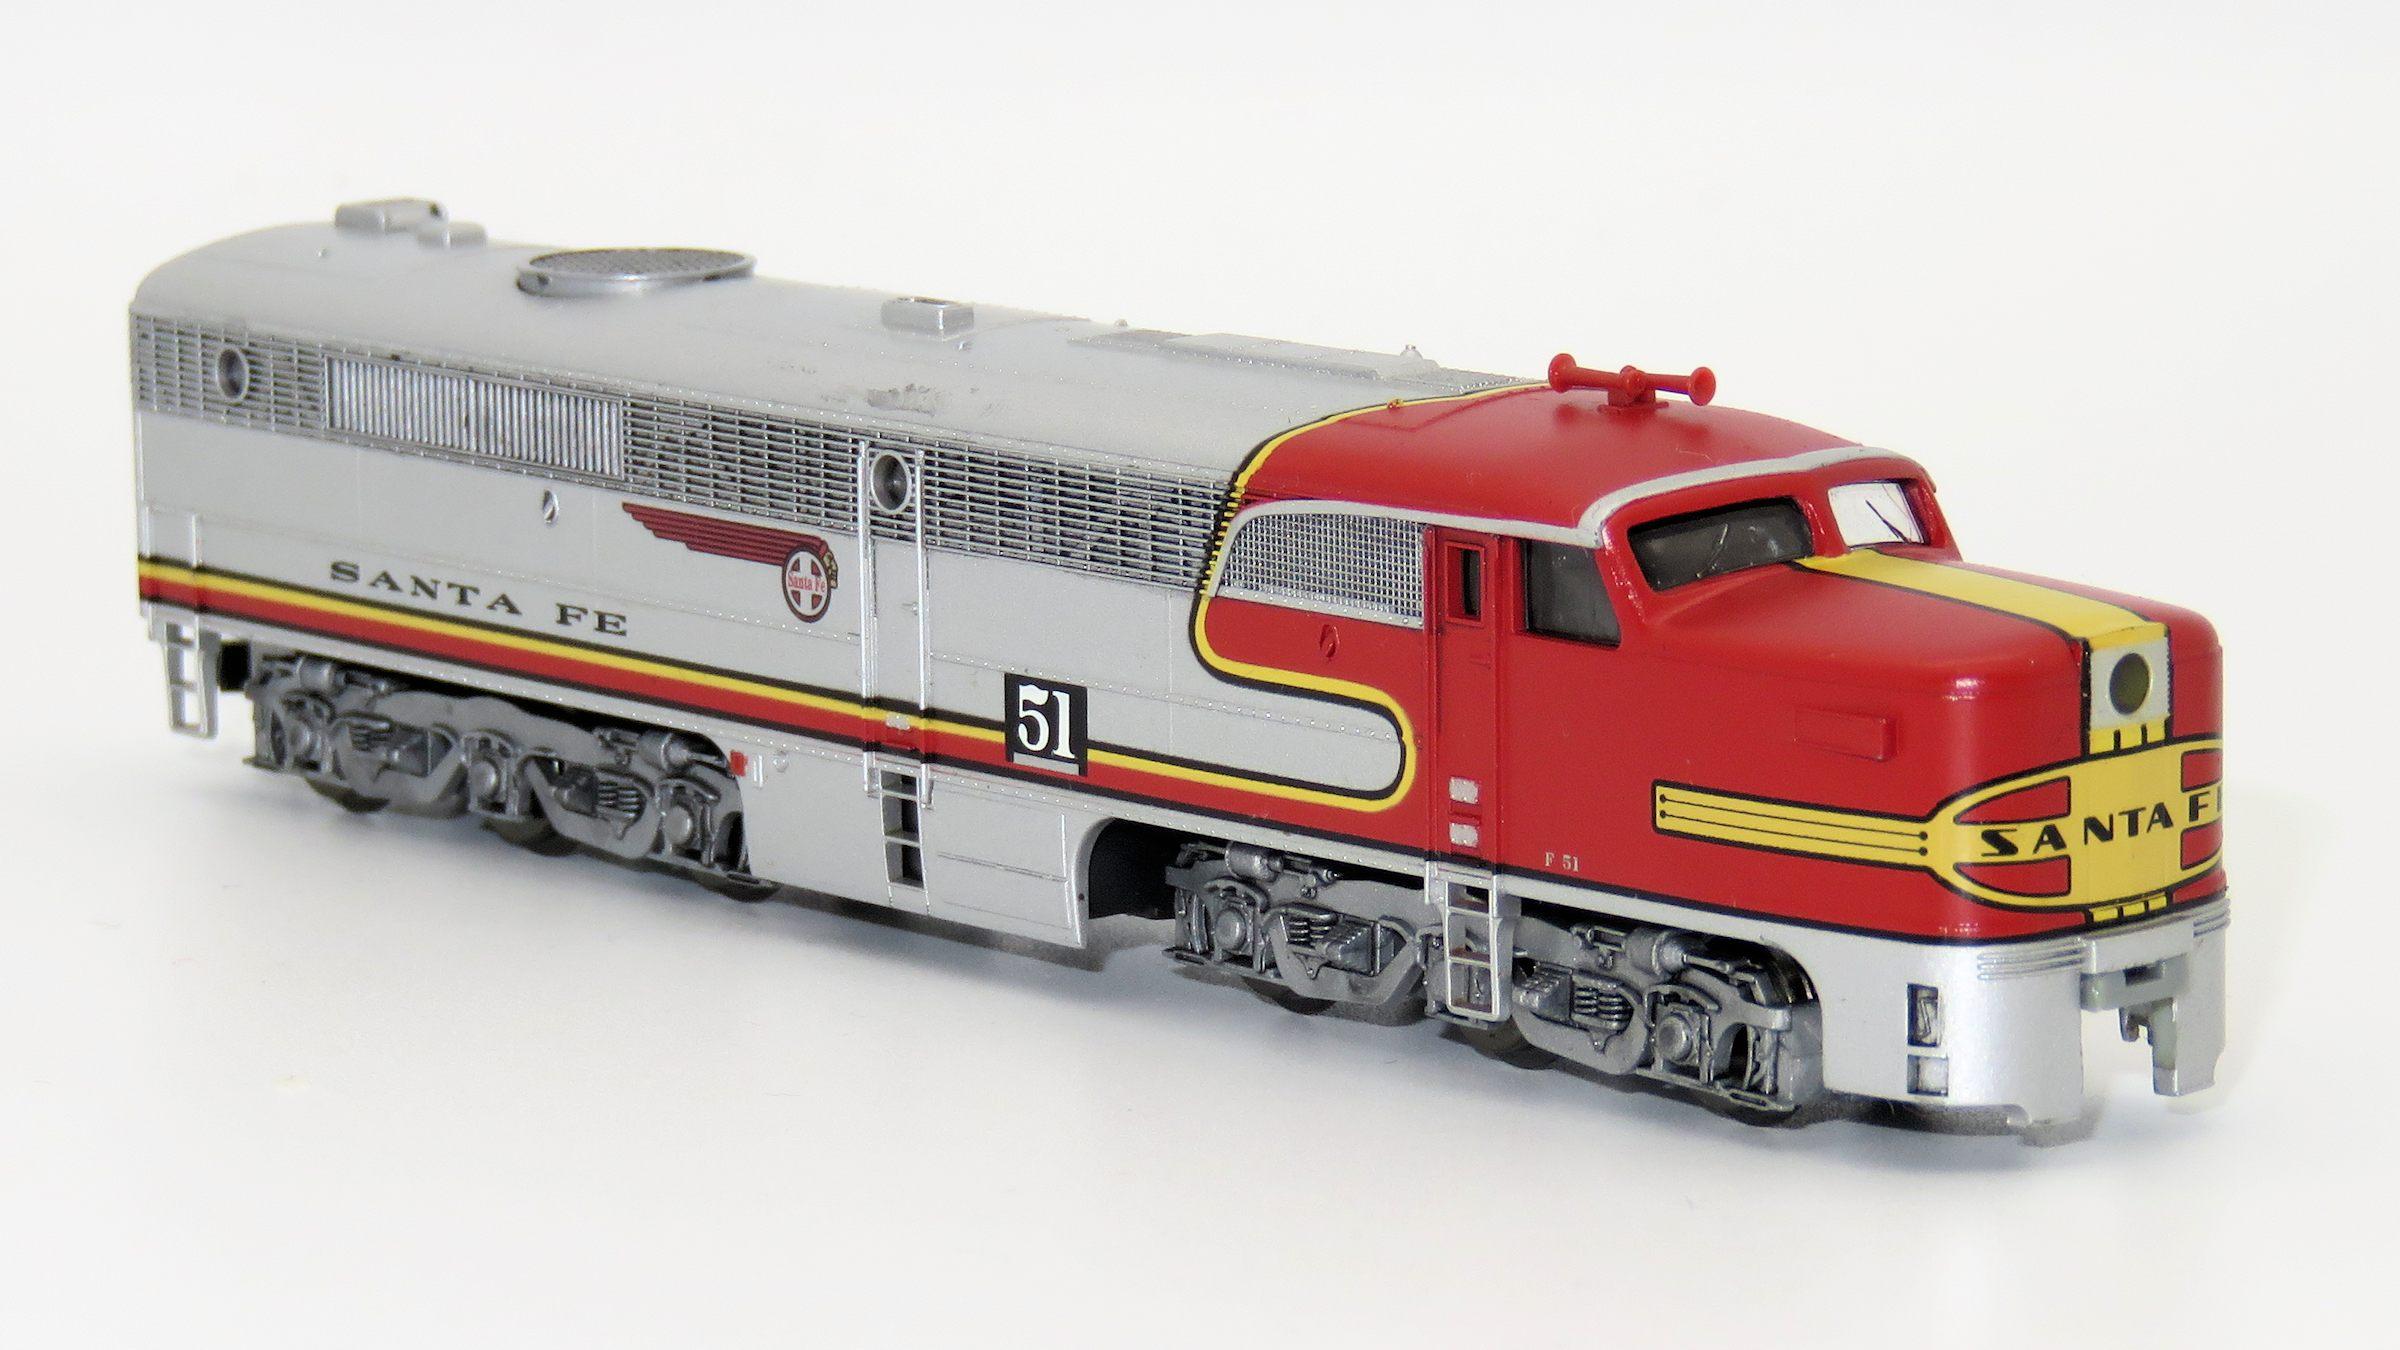 N Scale - Brawa - 1085 - Locomotive, Diesel, Alco PA-1 - Santa Fe - 51